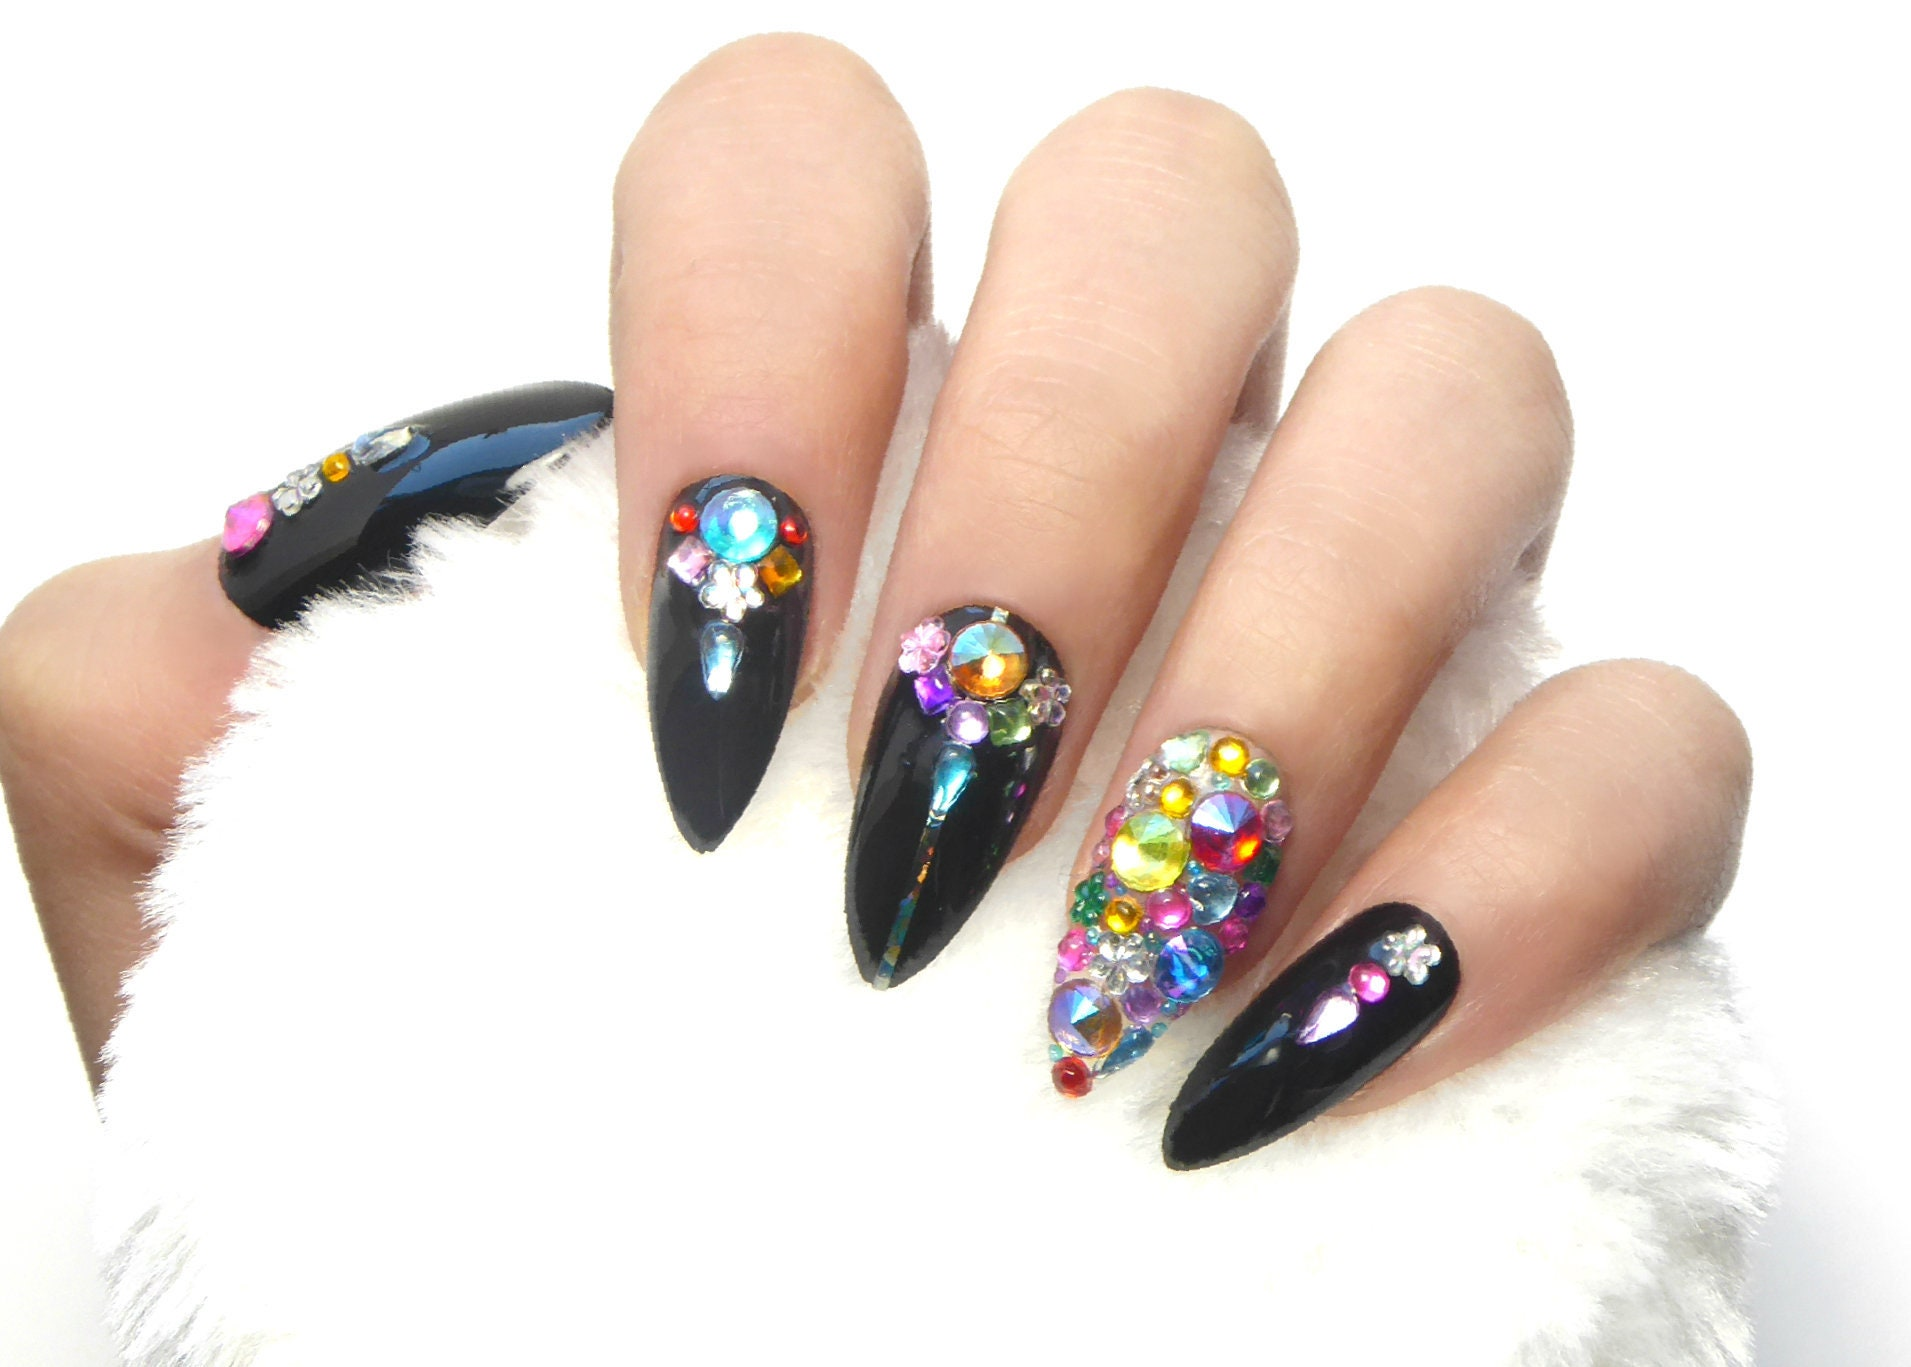 Festival Rainbow Jewelry Nails / Fake nails, press on nails, nail ...